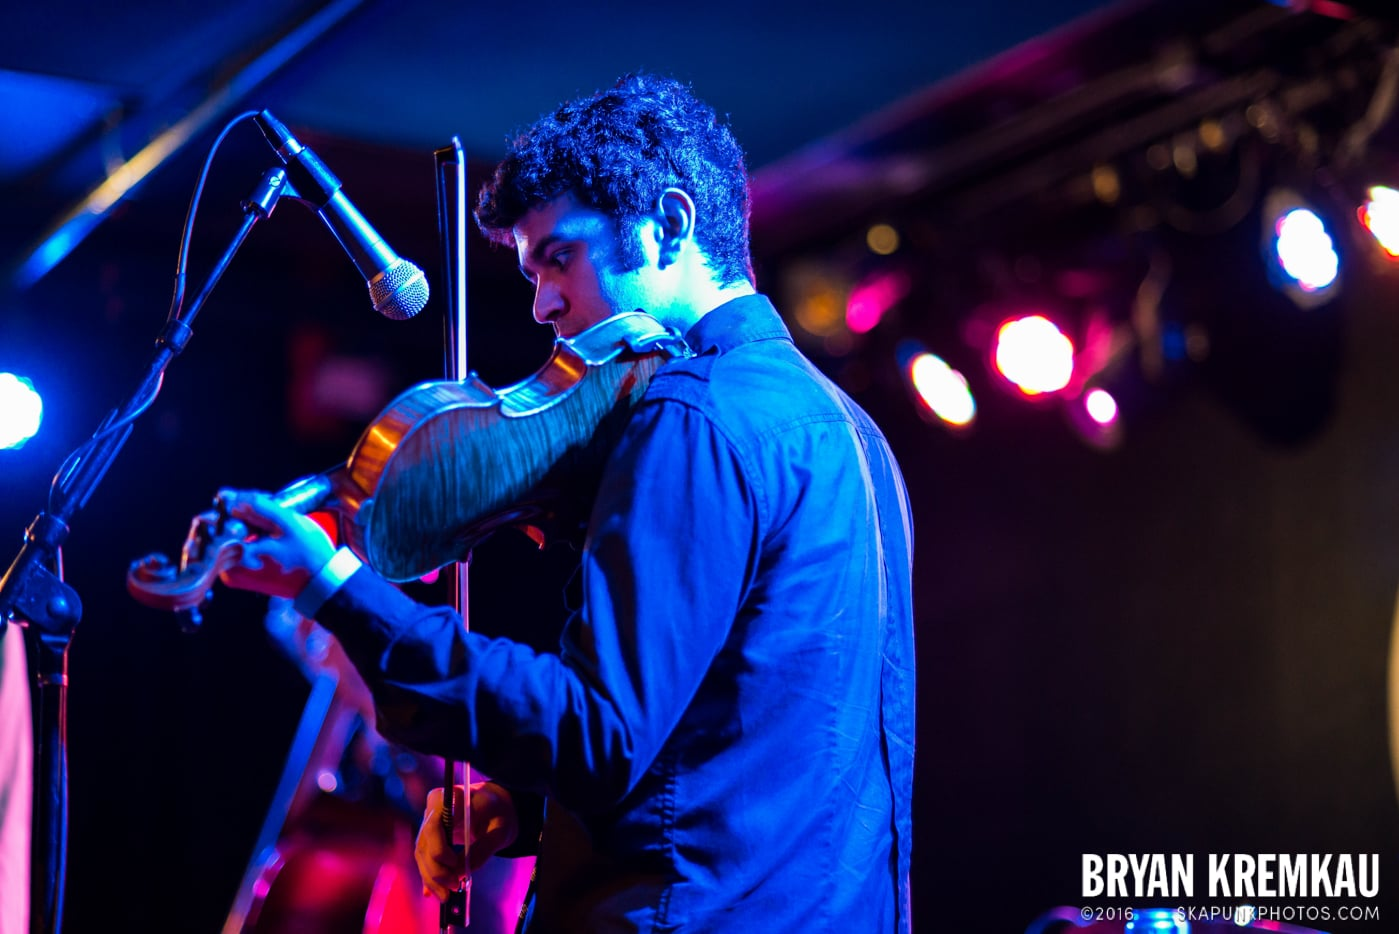 Danny Burns Band @ Knitting Factory, Brooklyn, NY - 9.10.14 (1)